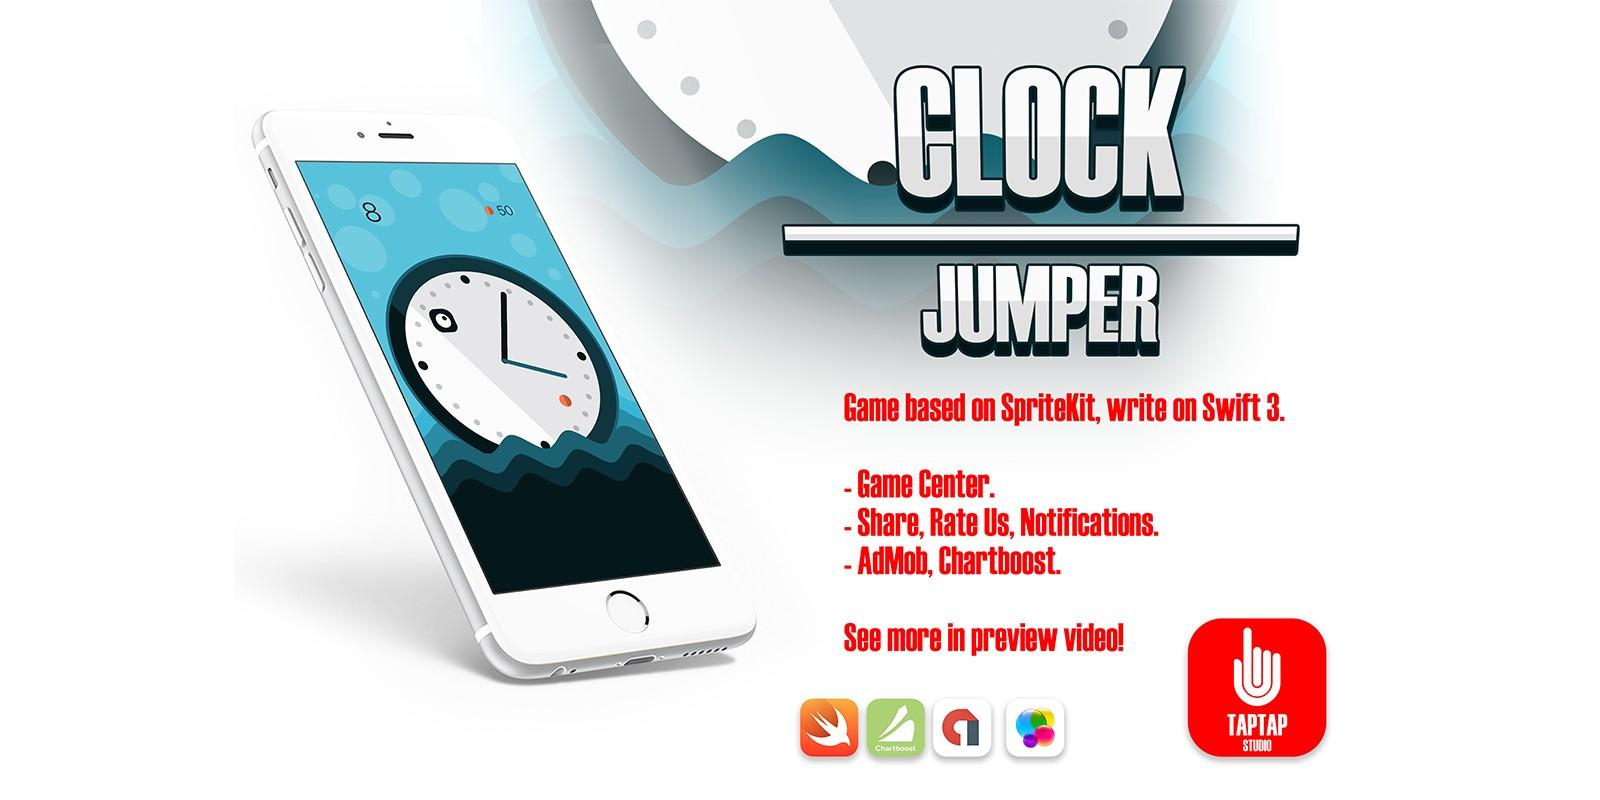 Clock Jumper - iOS Xcode Game Template